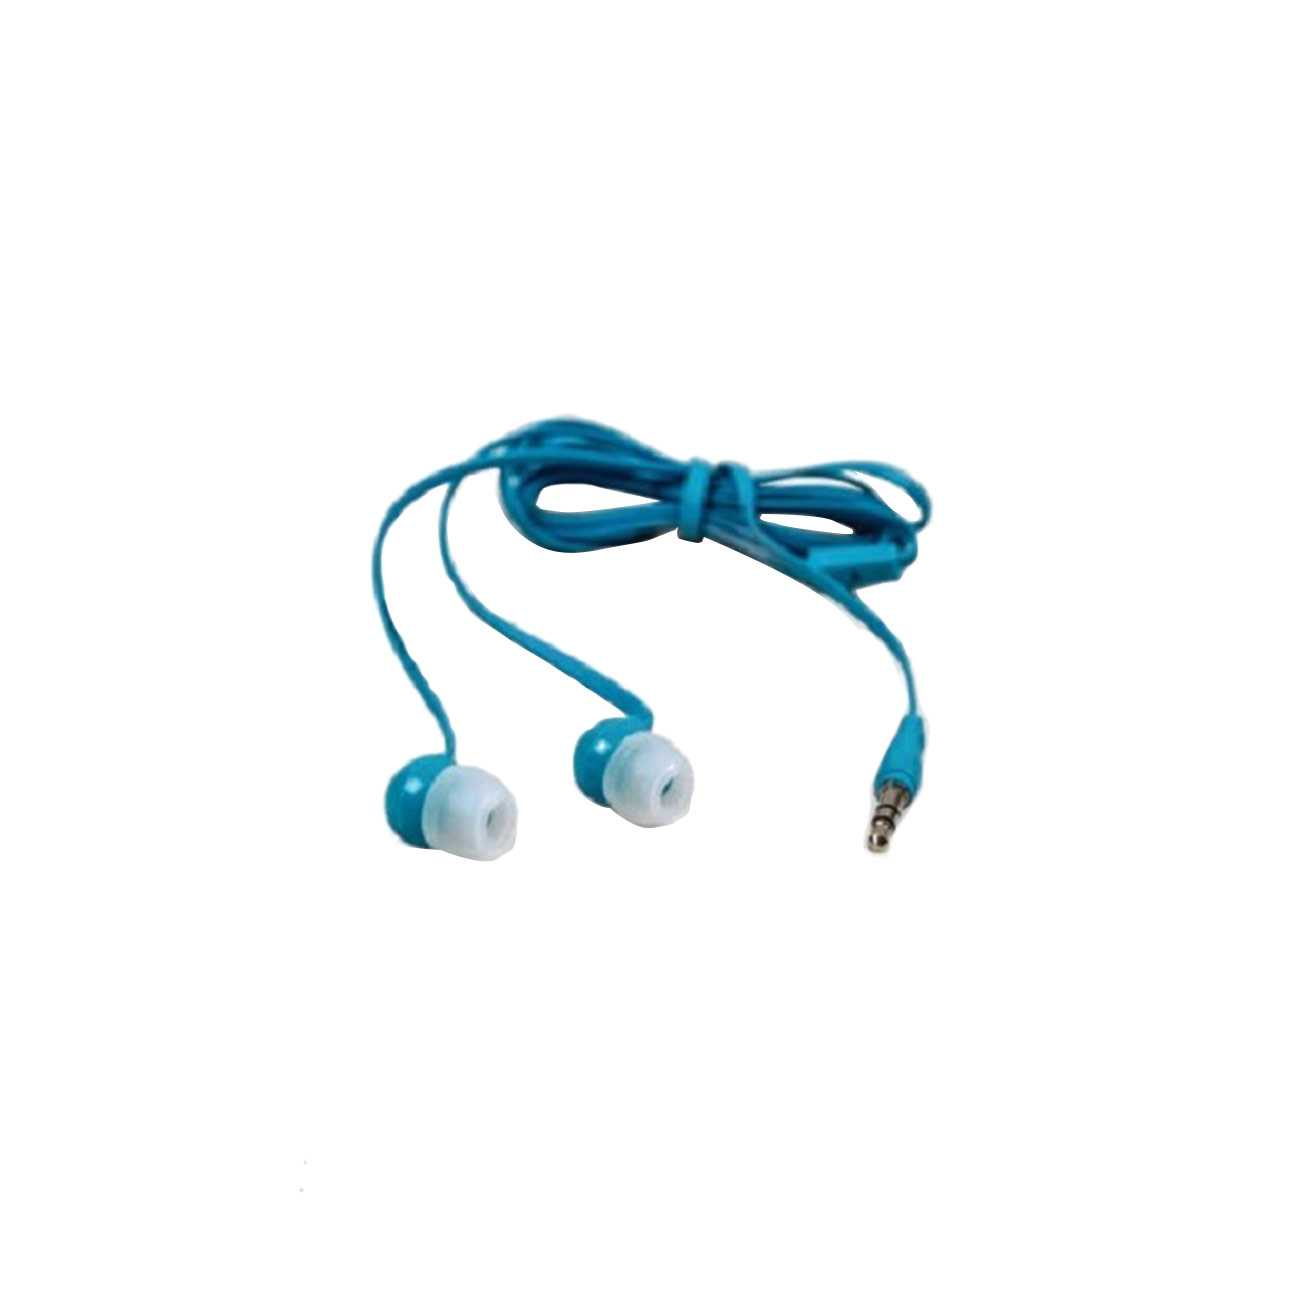 553 EAR PHONES